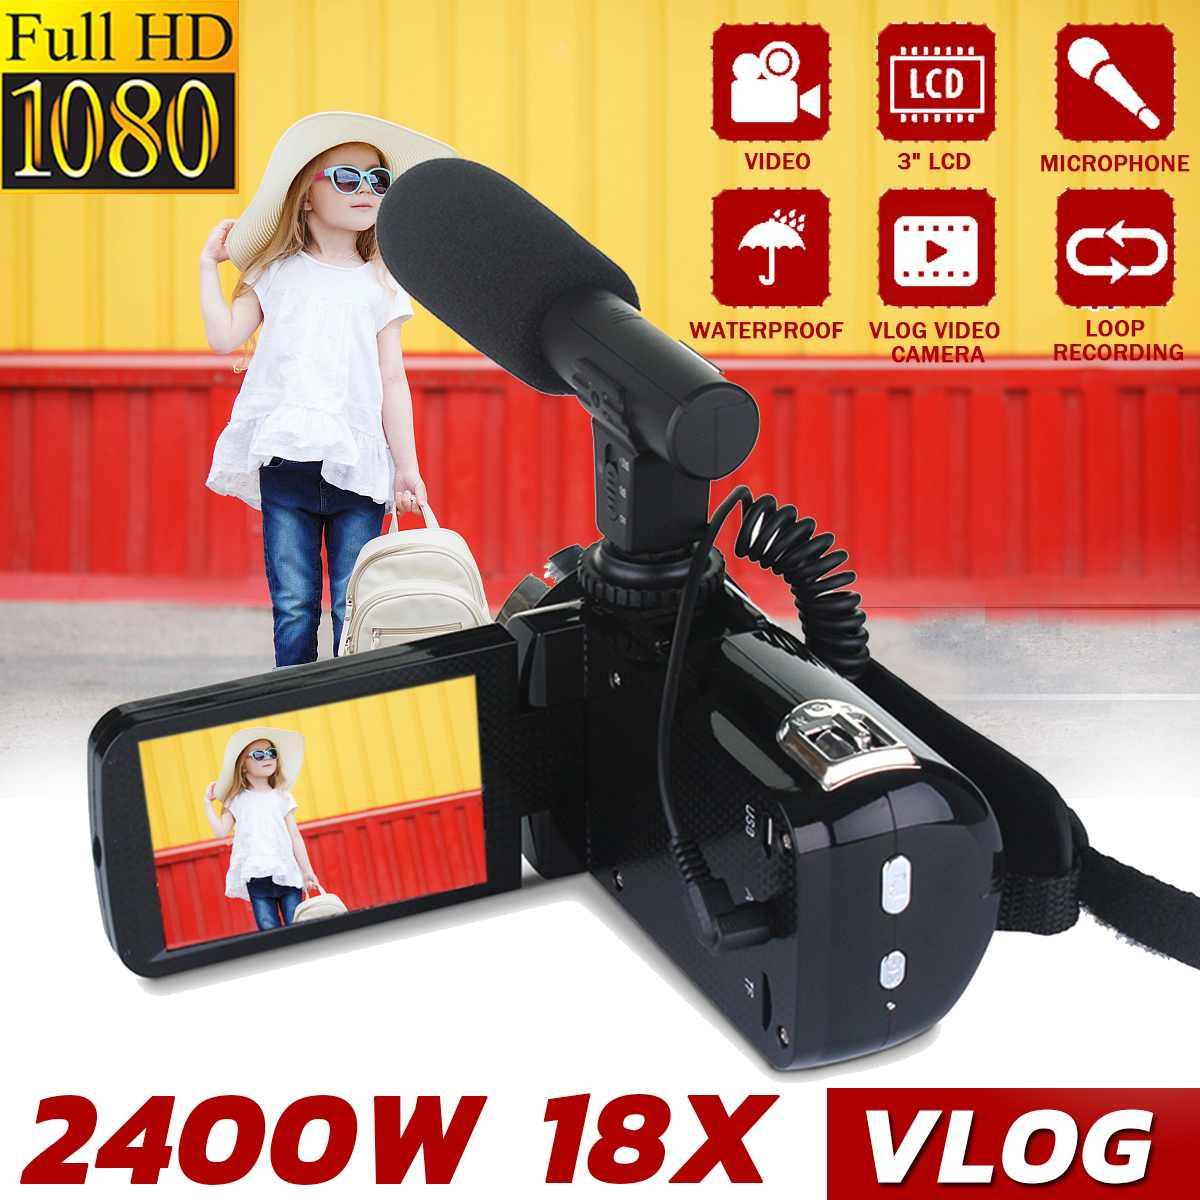 Sweet-Tempered Video Camera Camcorder Ordro 18x Digital Zoom Night Vision Vlogging Camera Filmadora For Youtube Blogger Lovely Luster